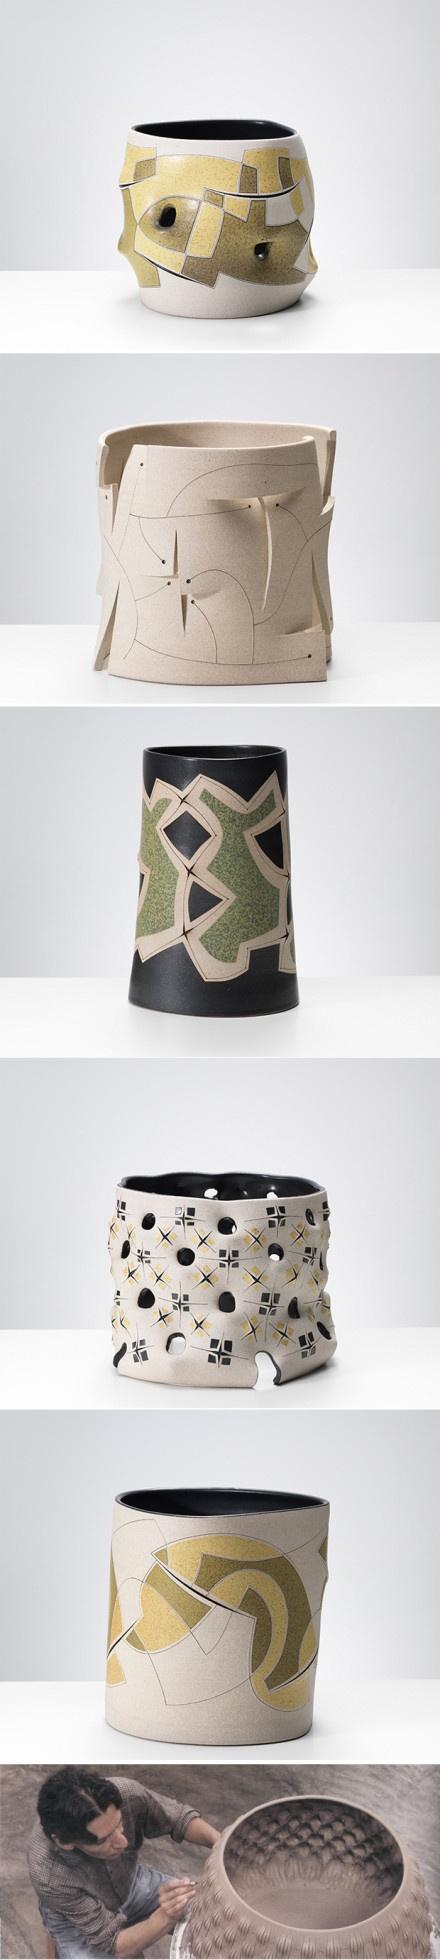 Gustavo Perez - Cups